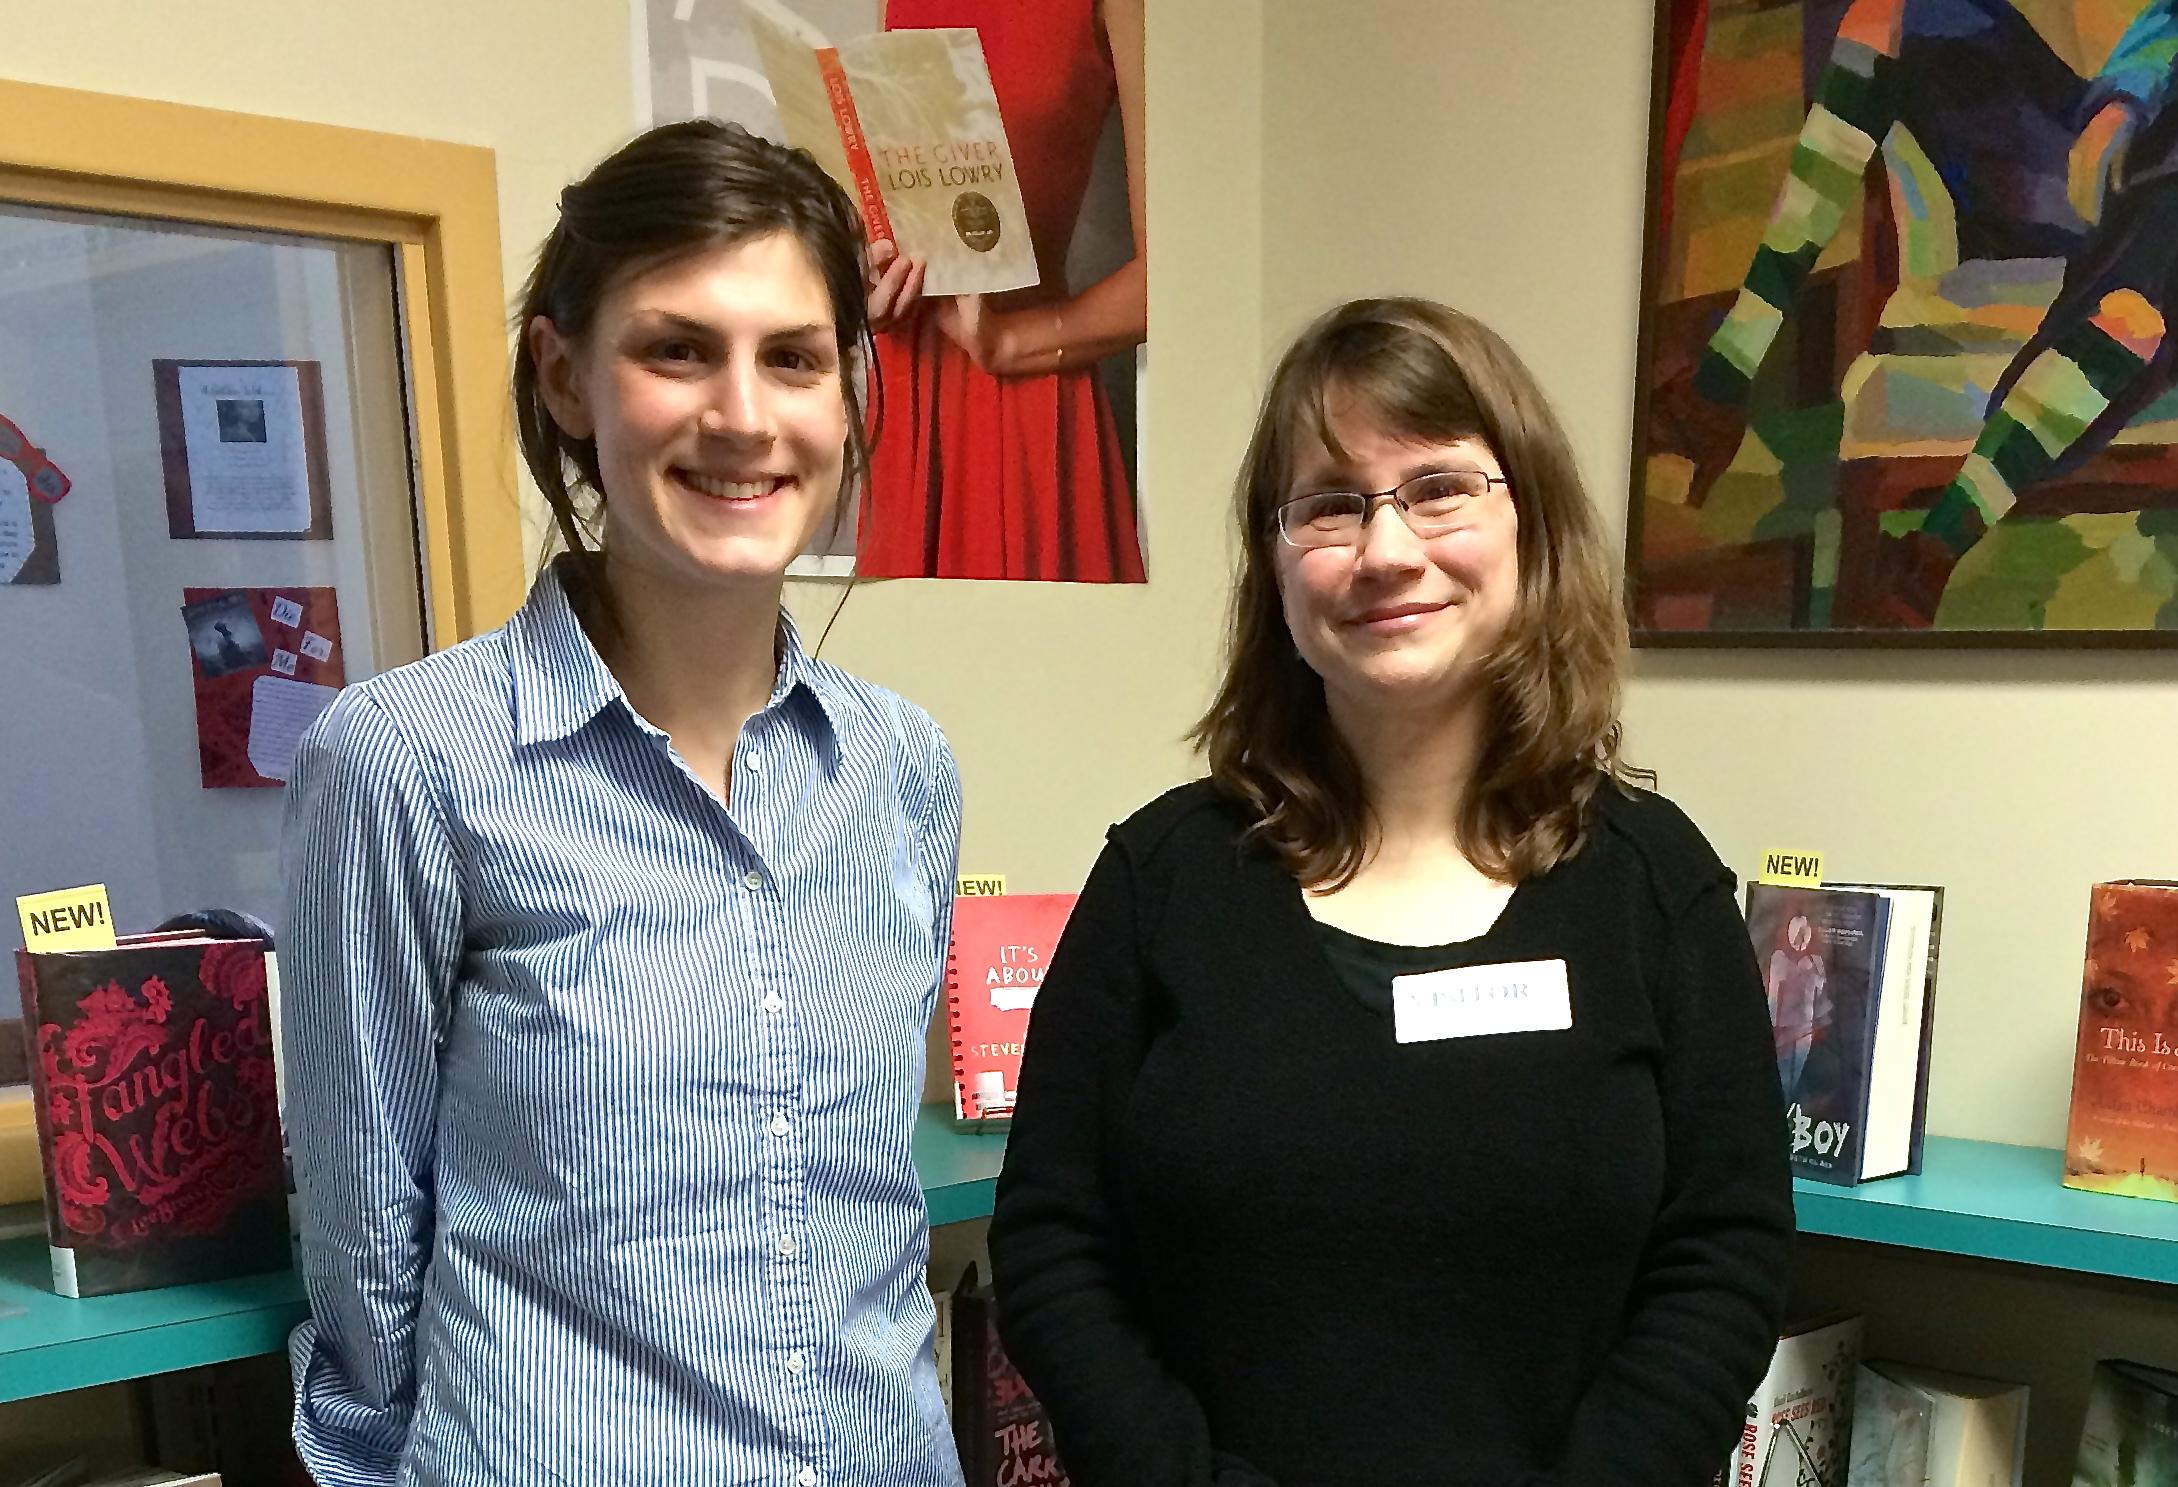 Jennifer Noel with Westbrook High School teacher, Julie McCabe